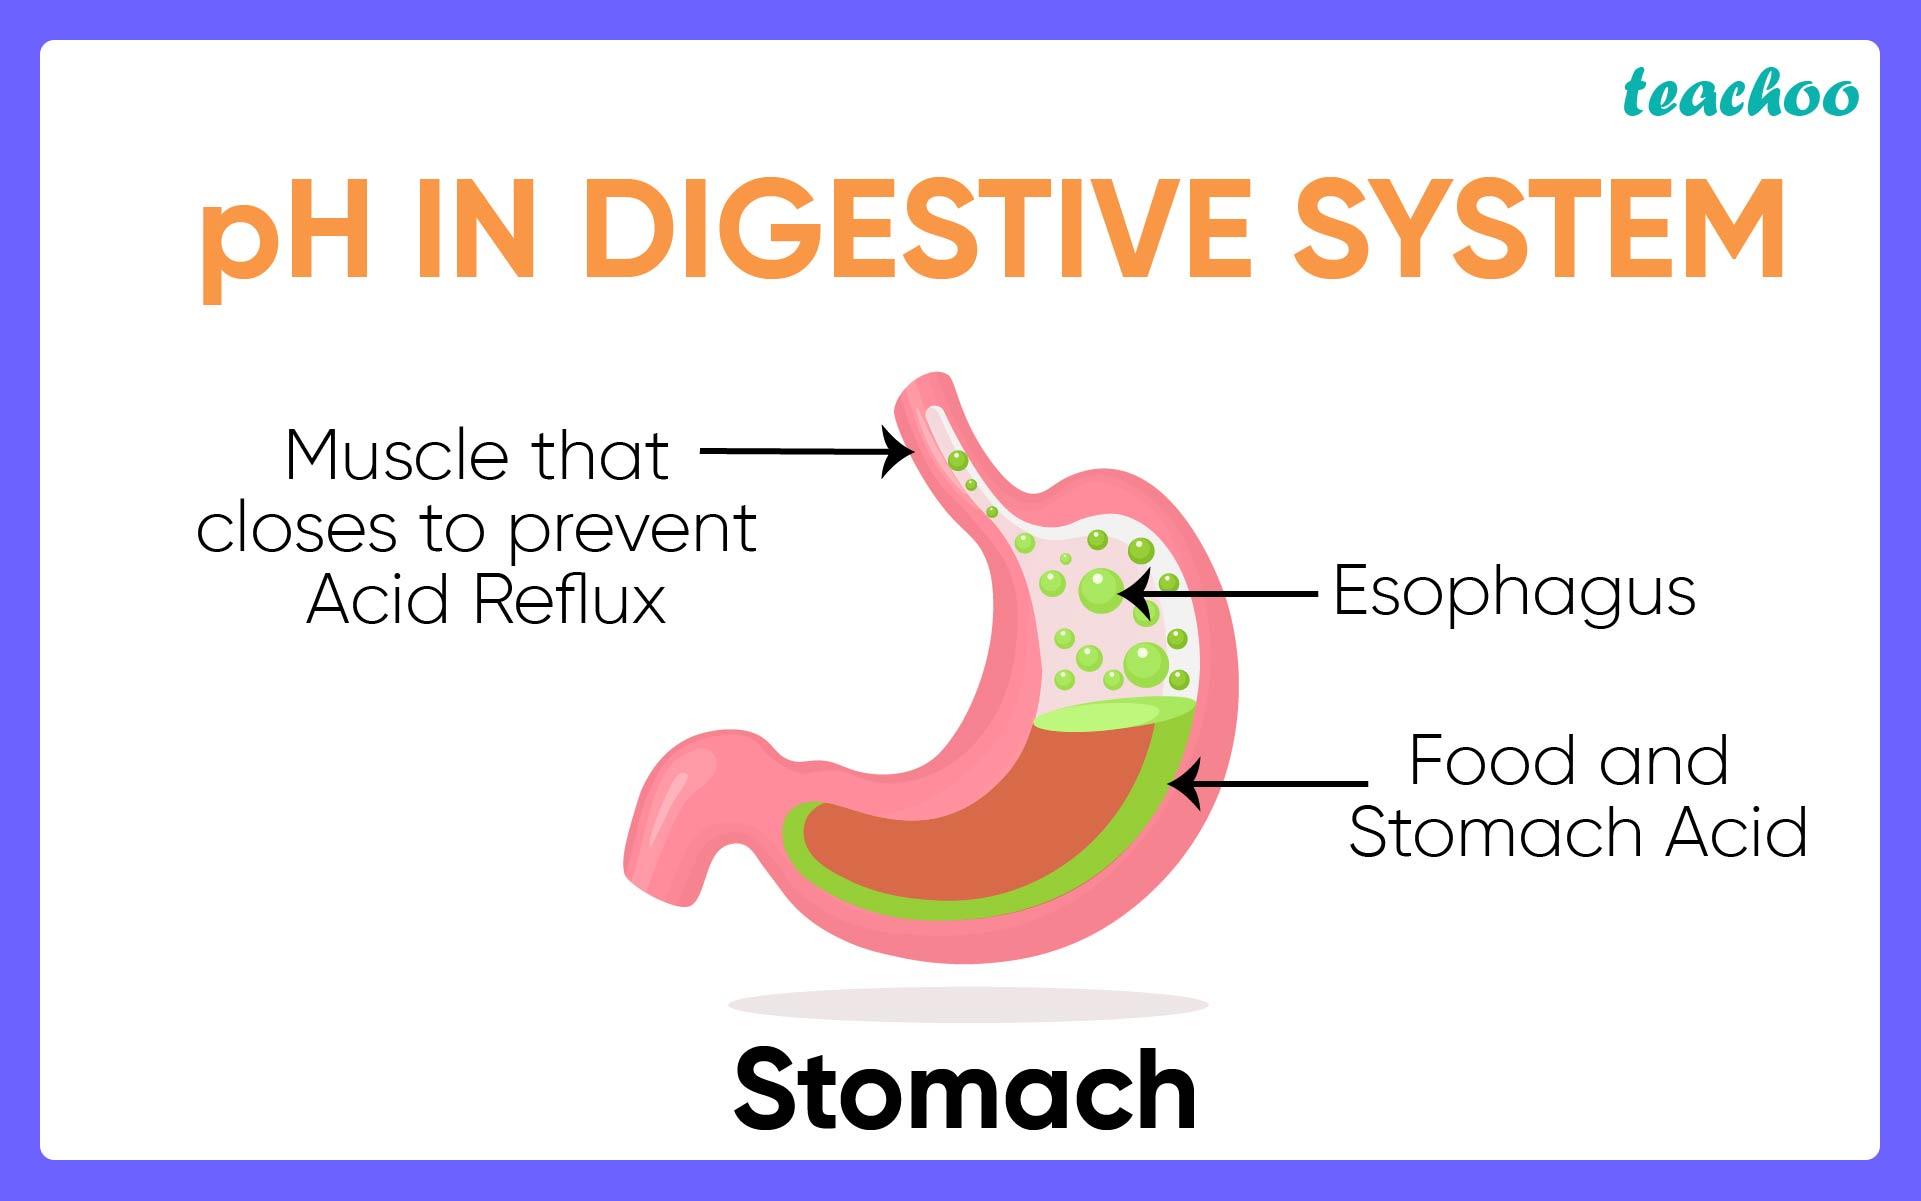 pH in Digestive System-Teachoo.jpg